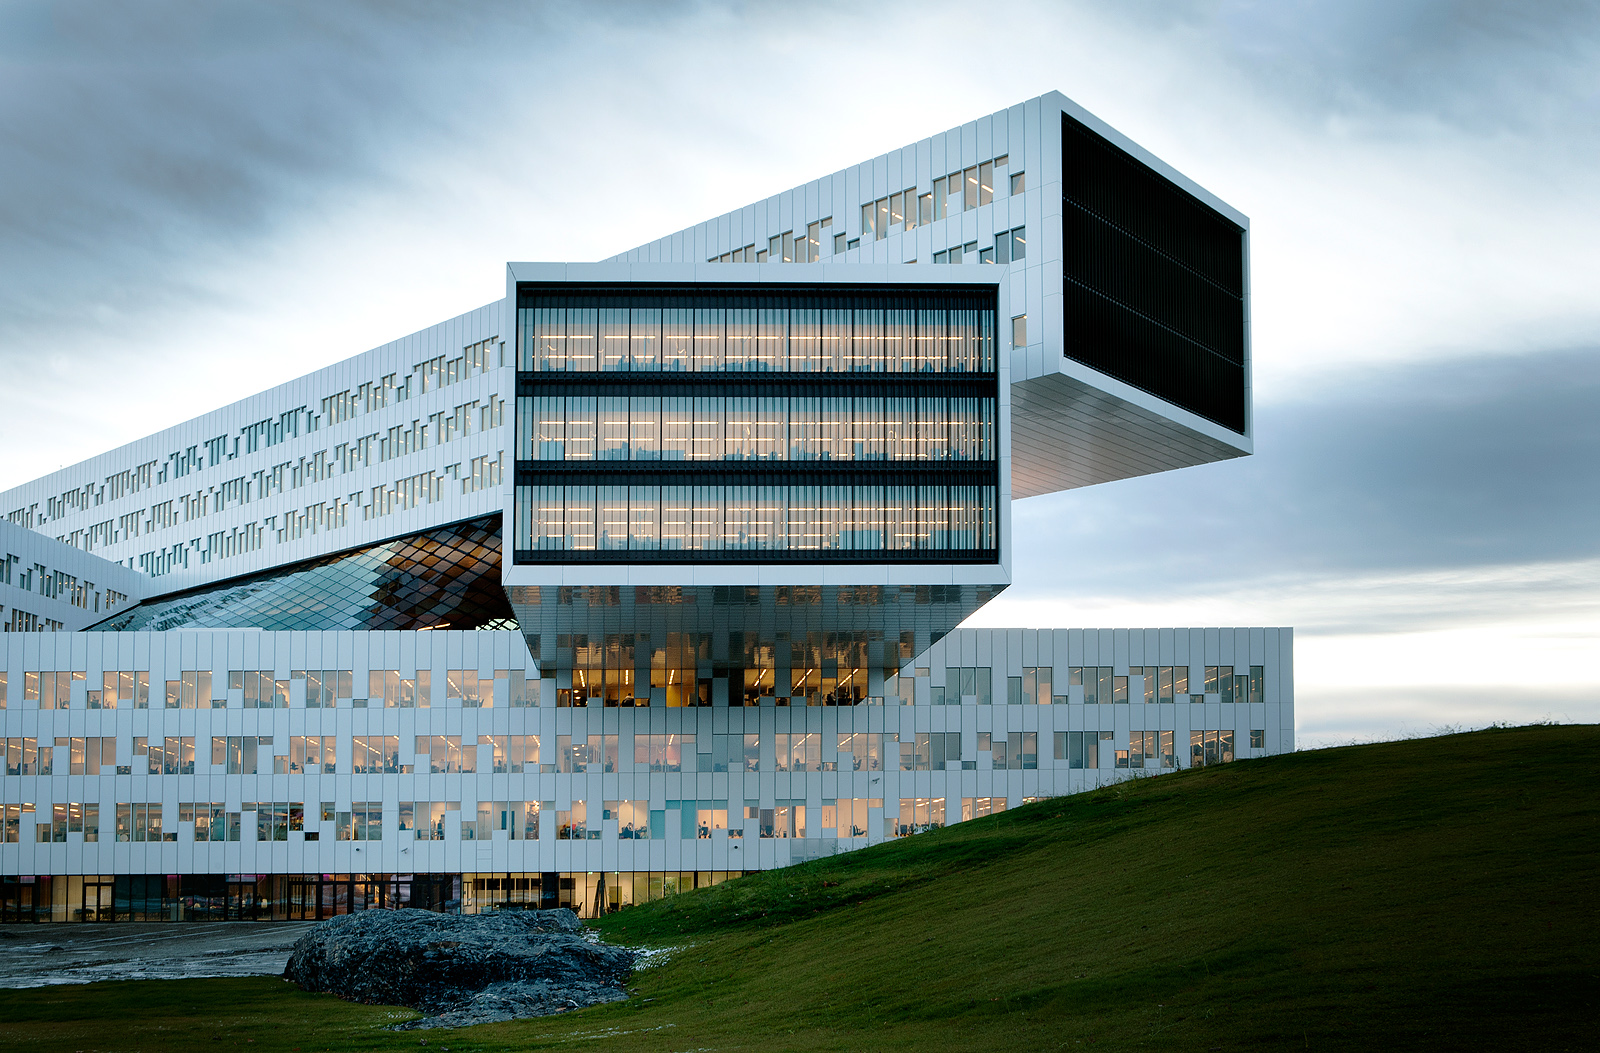 arkitektur-oslo-3-foto-ruben-kvamme